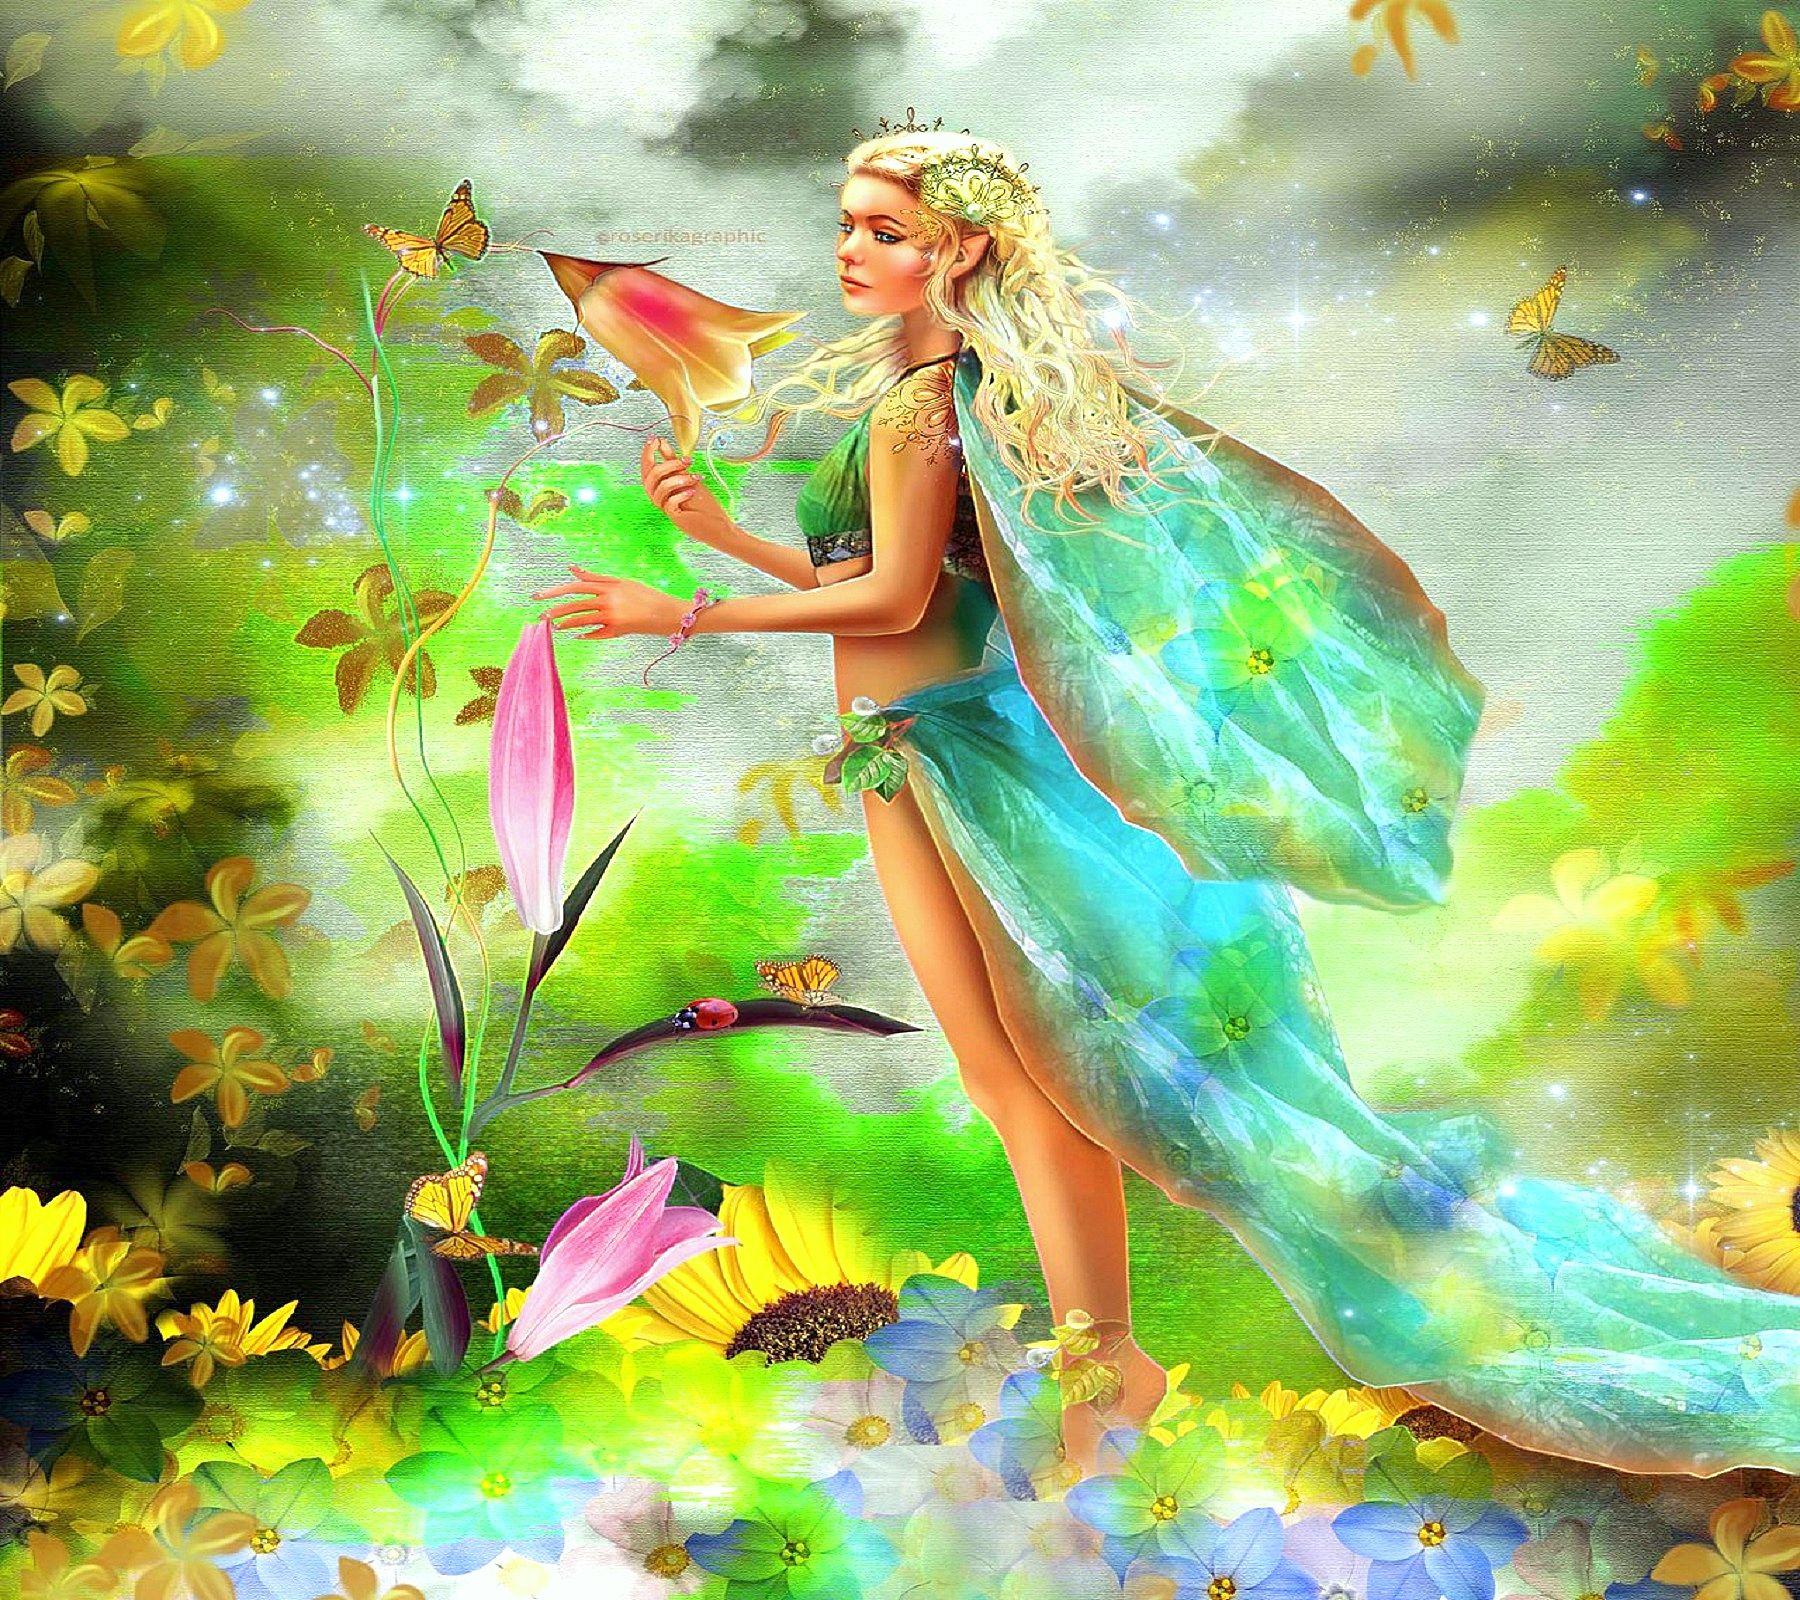 19201080 Fairy Desktop Wallpaper 1920x1080 Wallpapers Gallery Fairy Wallpaper Beautiful Fairies Fairy Art